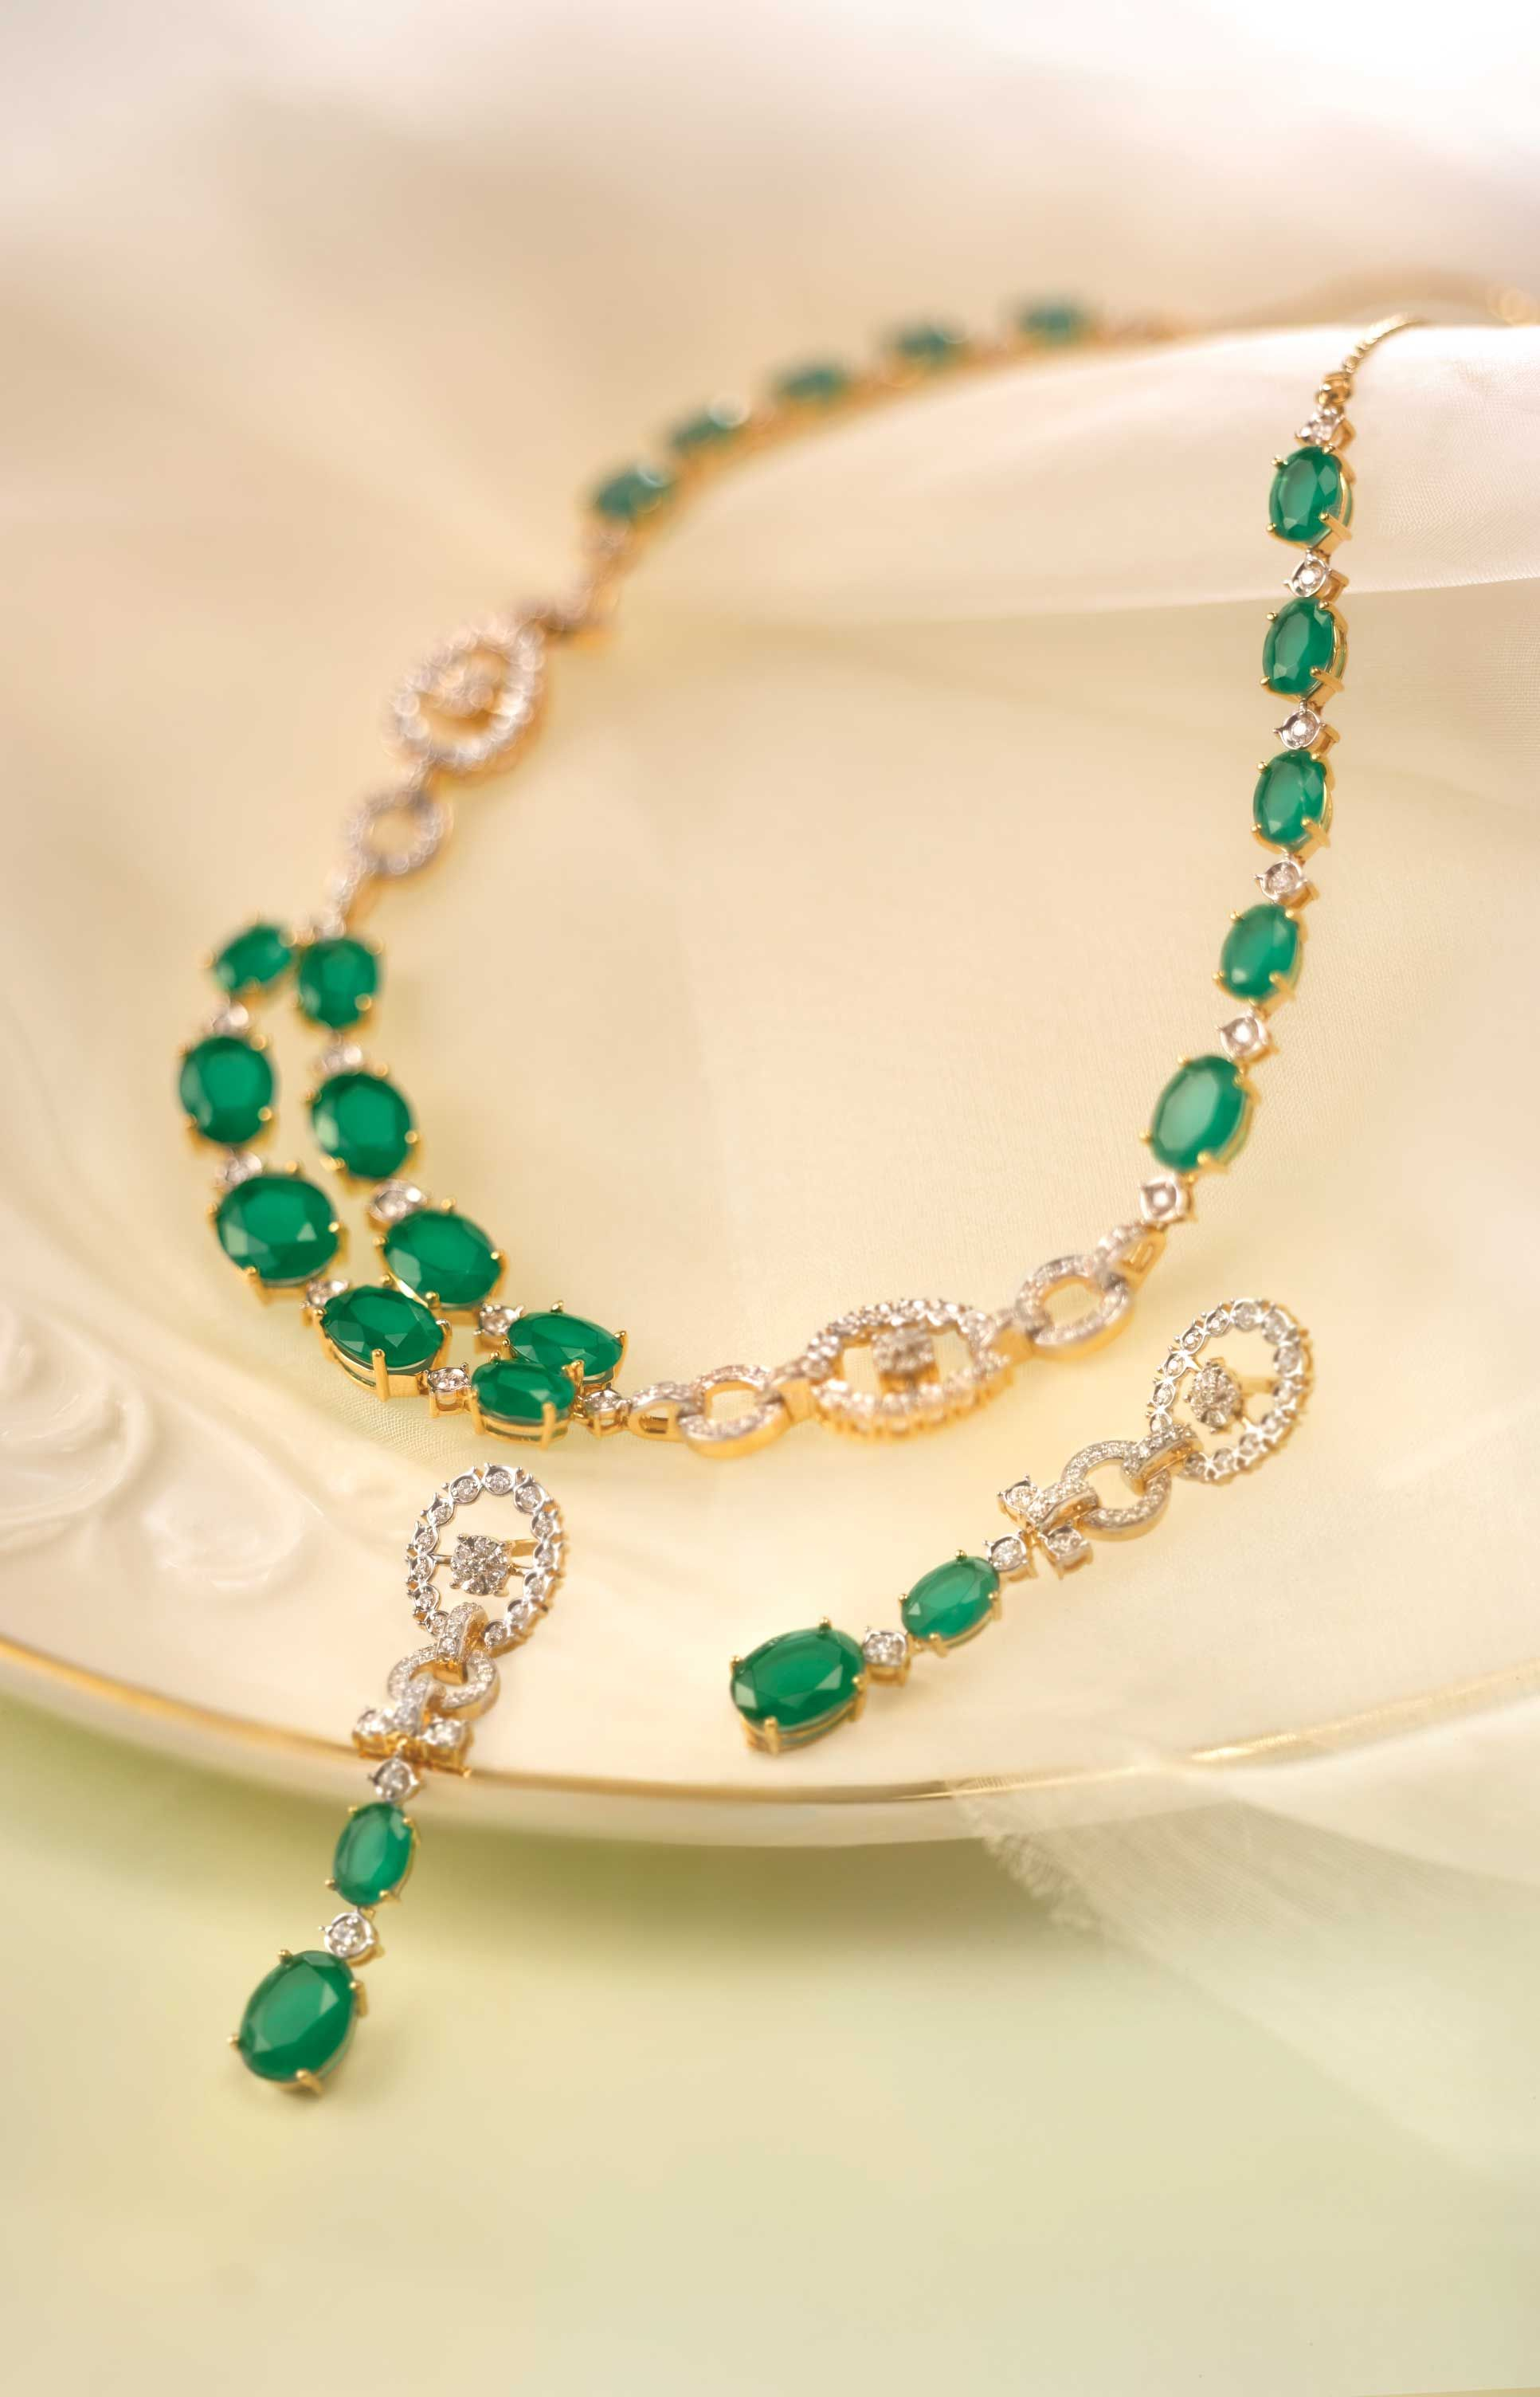 Pin by foziya khan on accessories pinterest jewelry diamond and